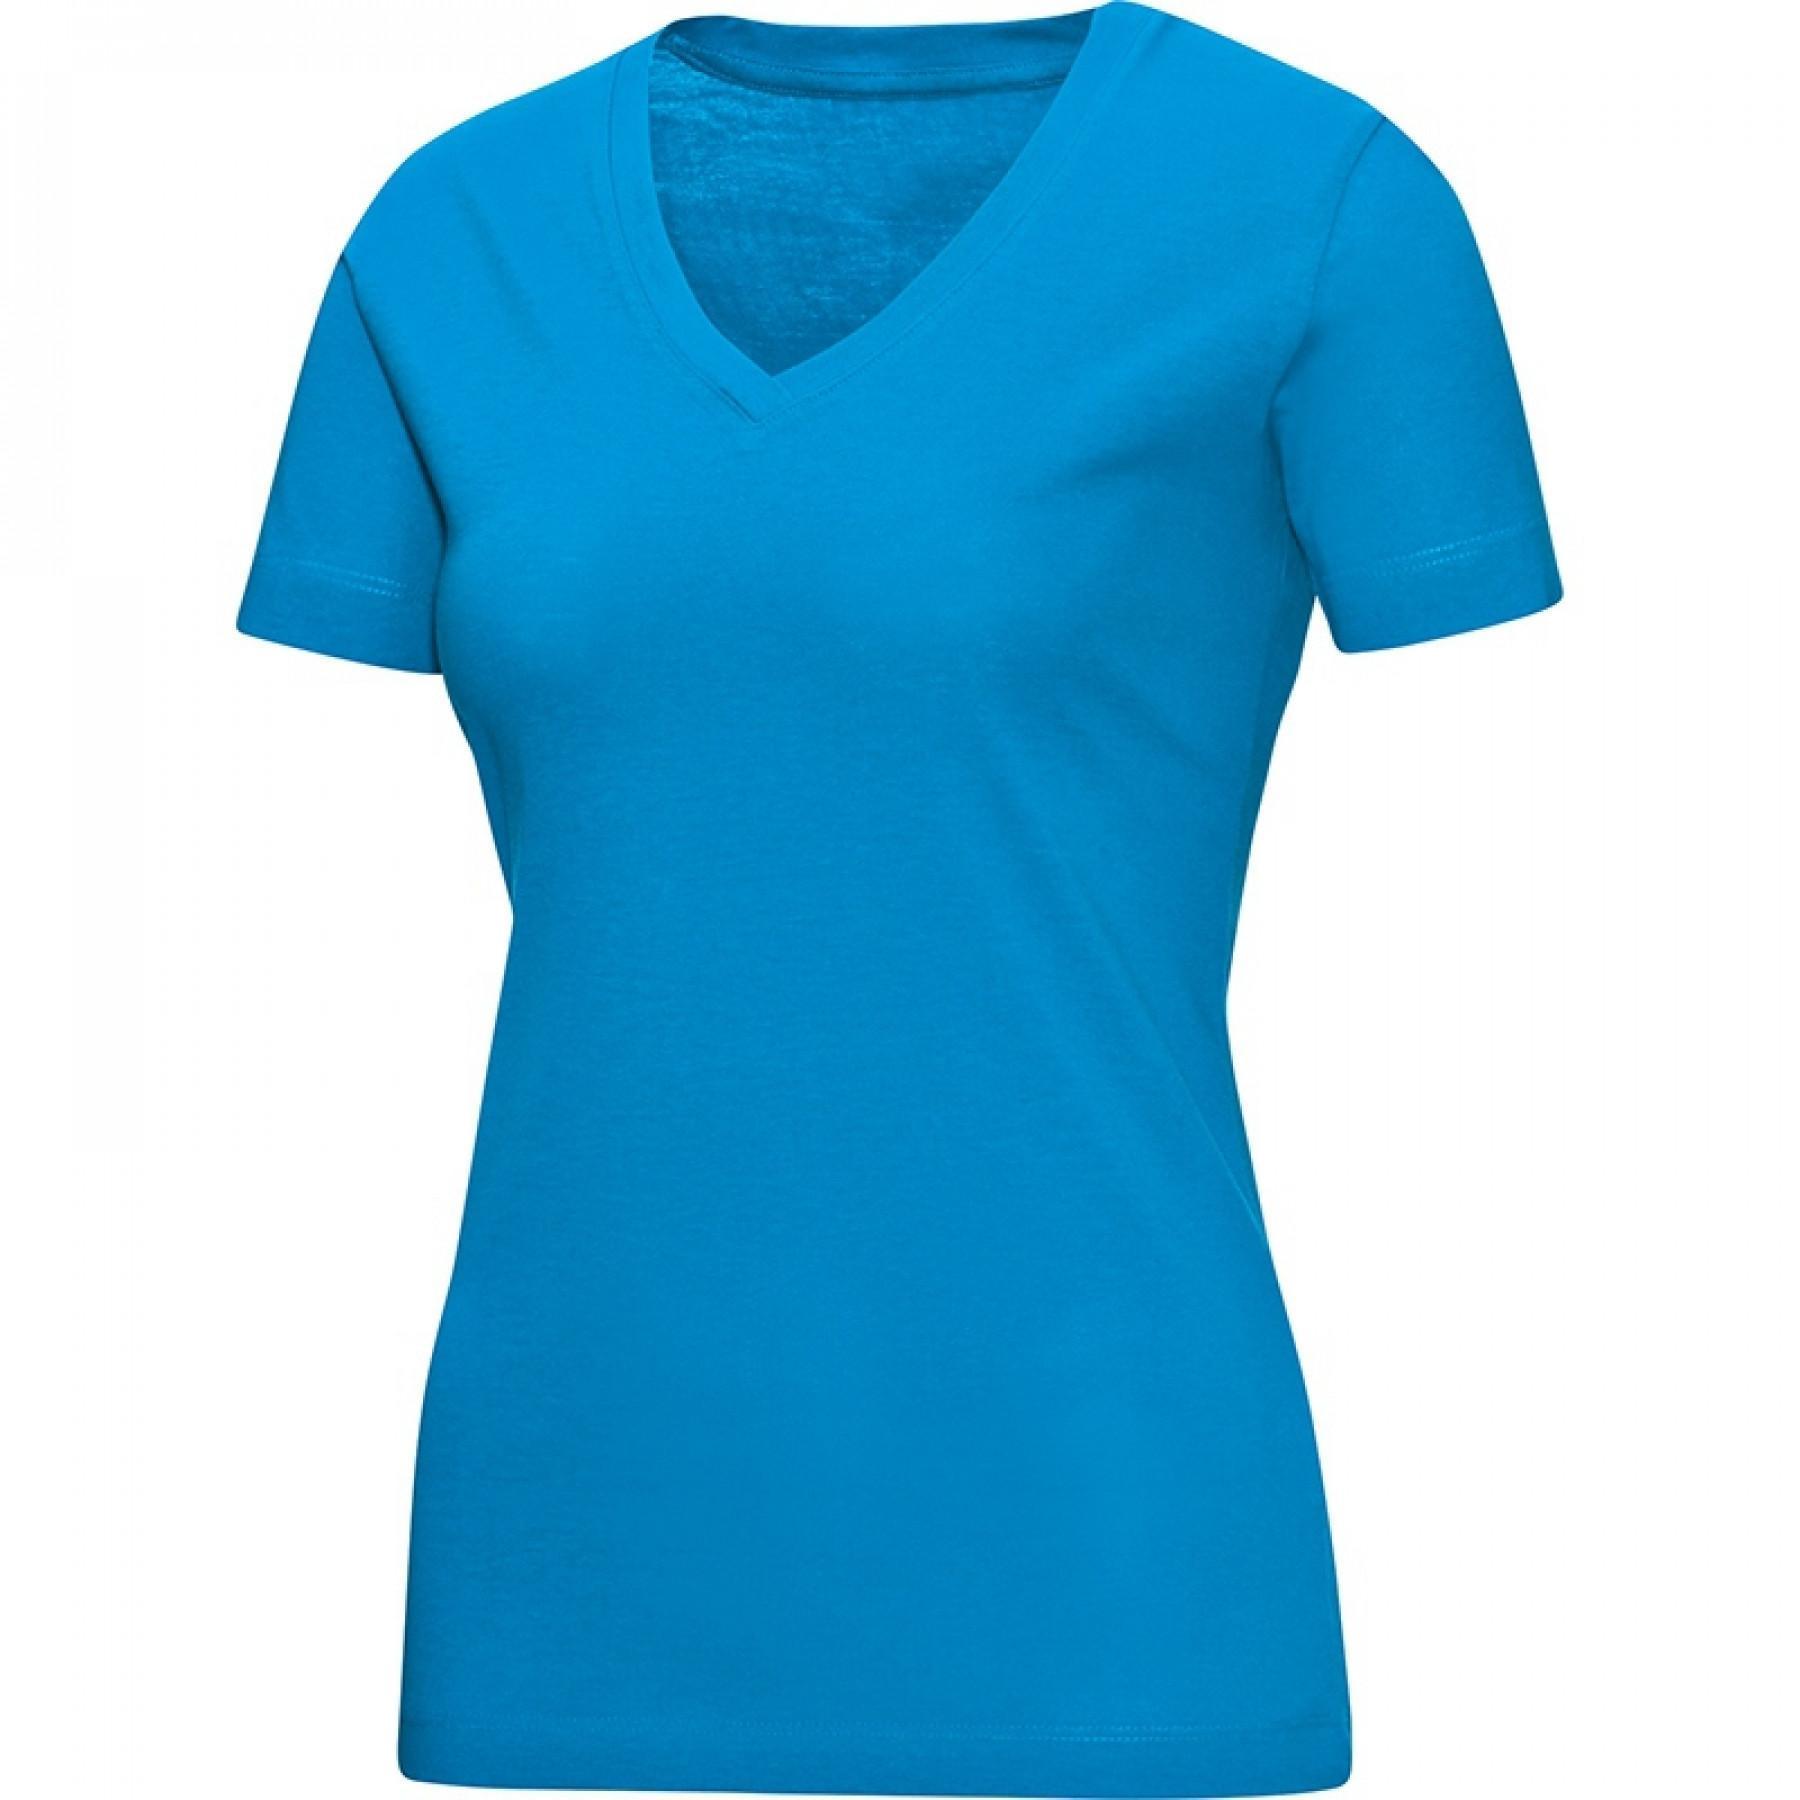 T-shirt woman Jako v-neck